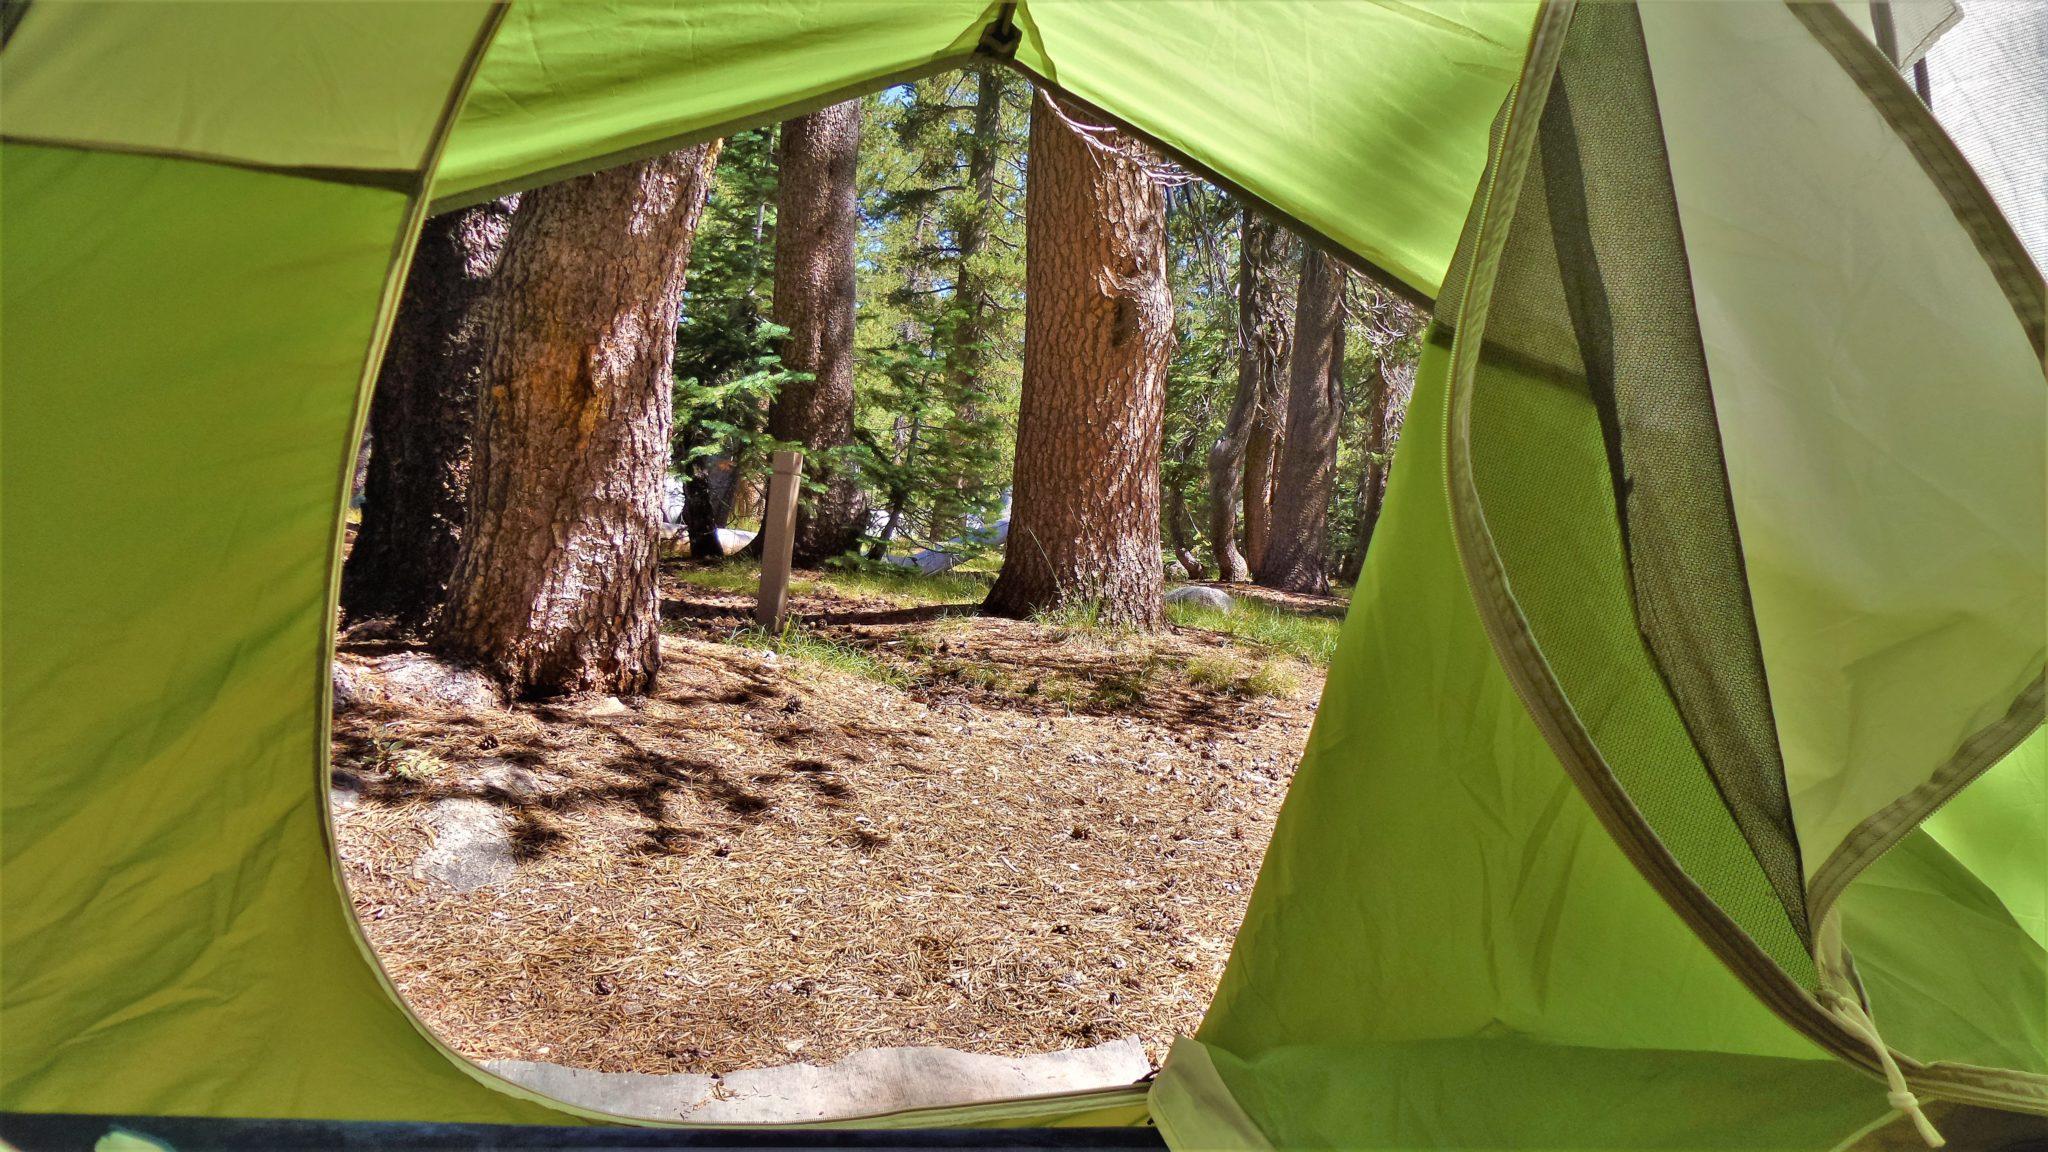 Tent View, Porcupine Flat, Yosemite National Park, California